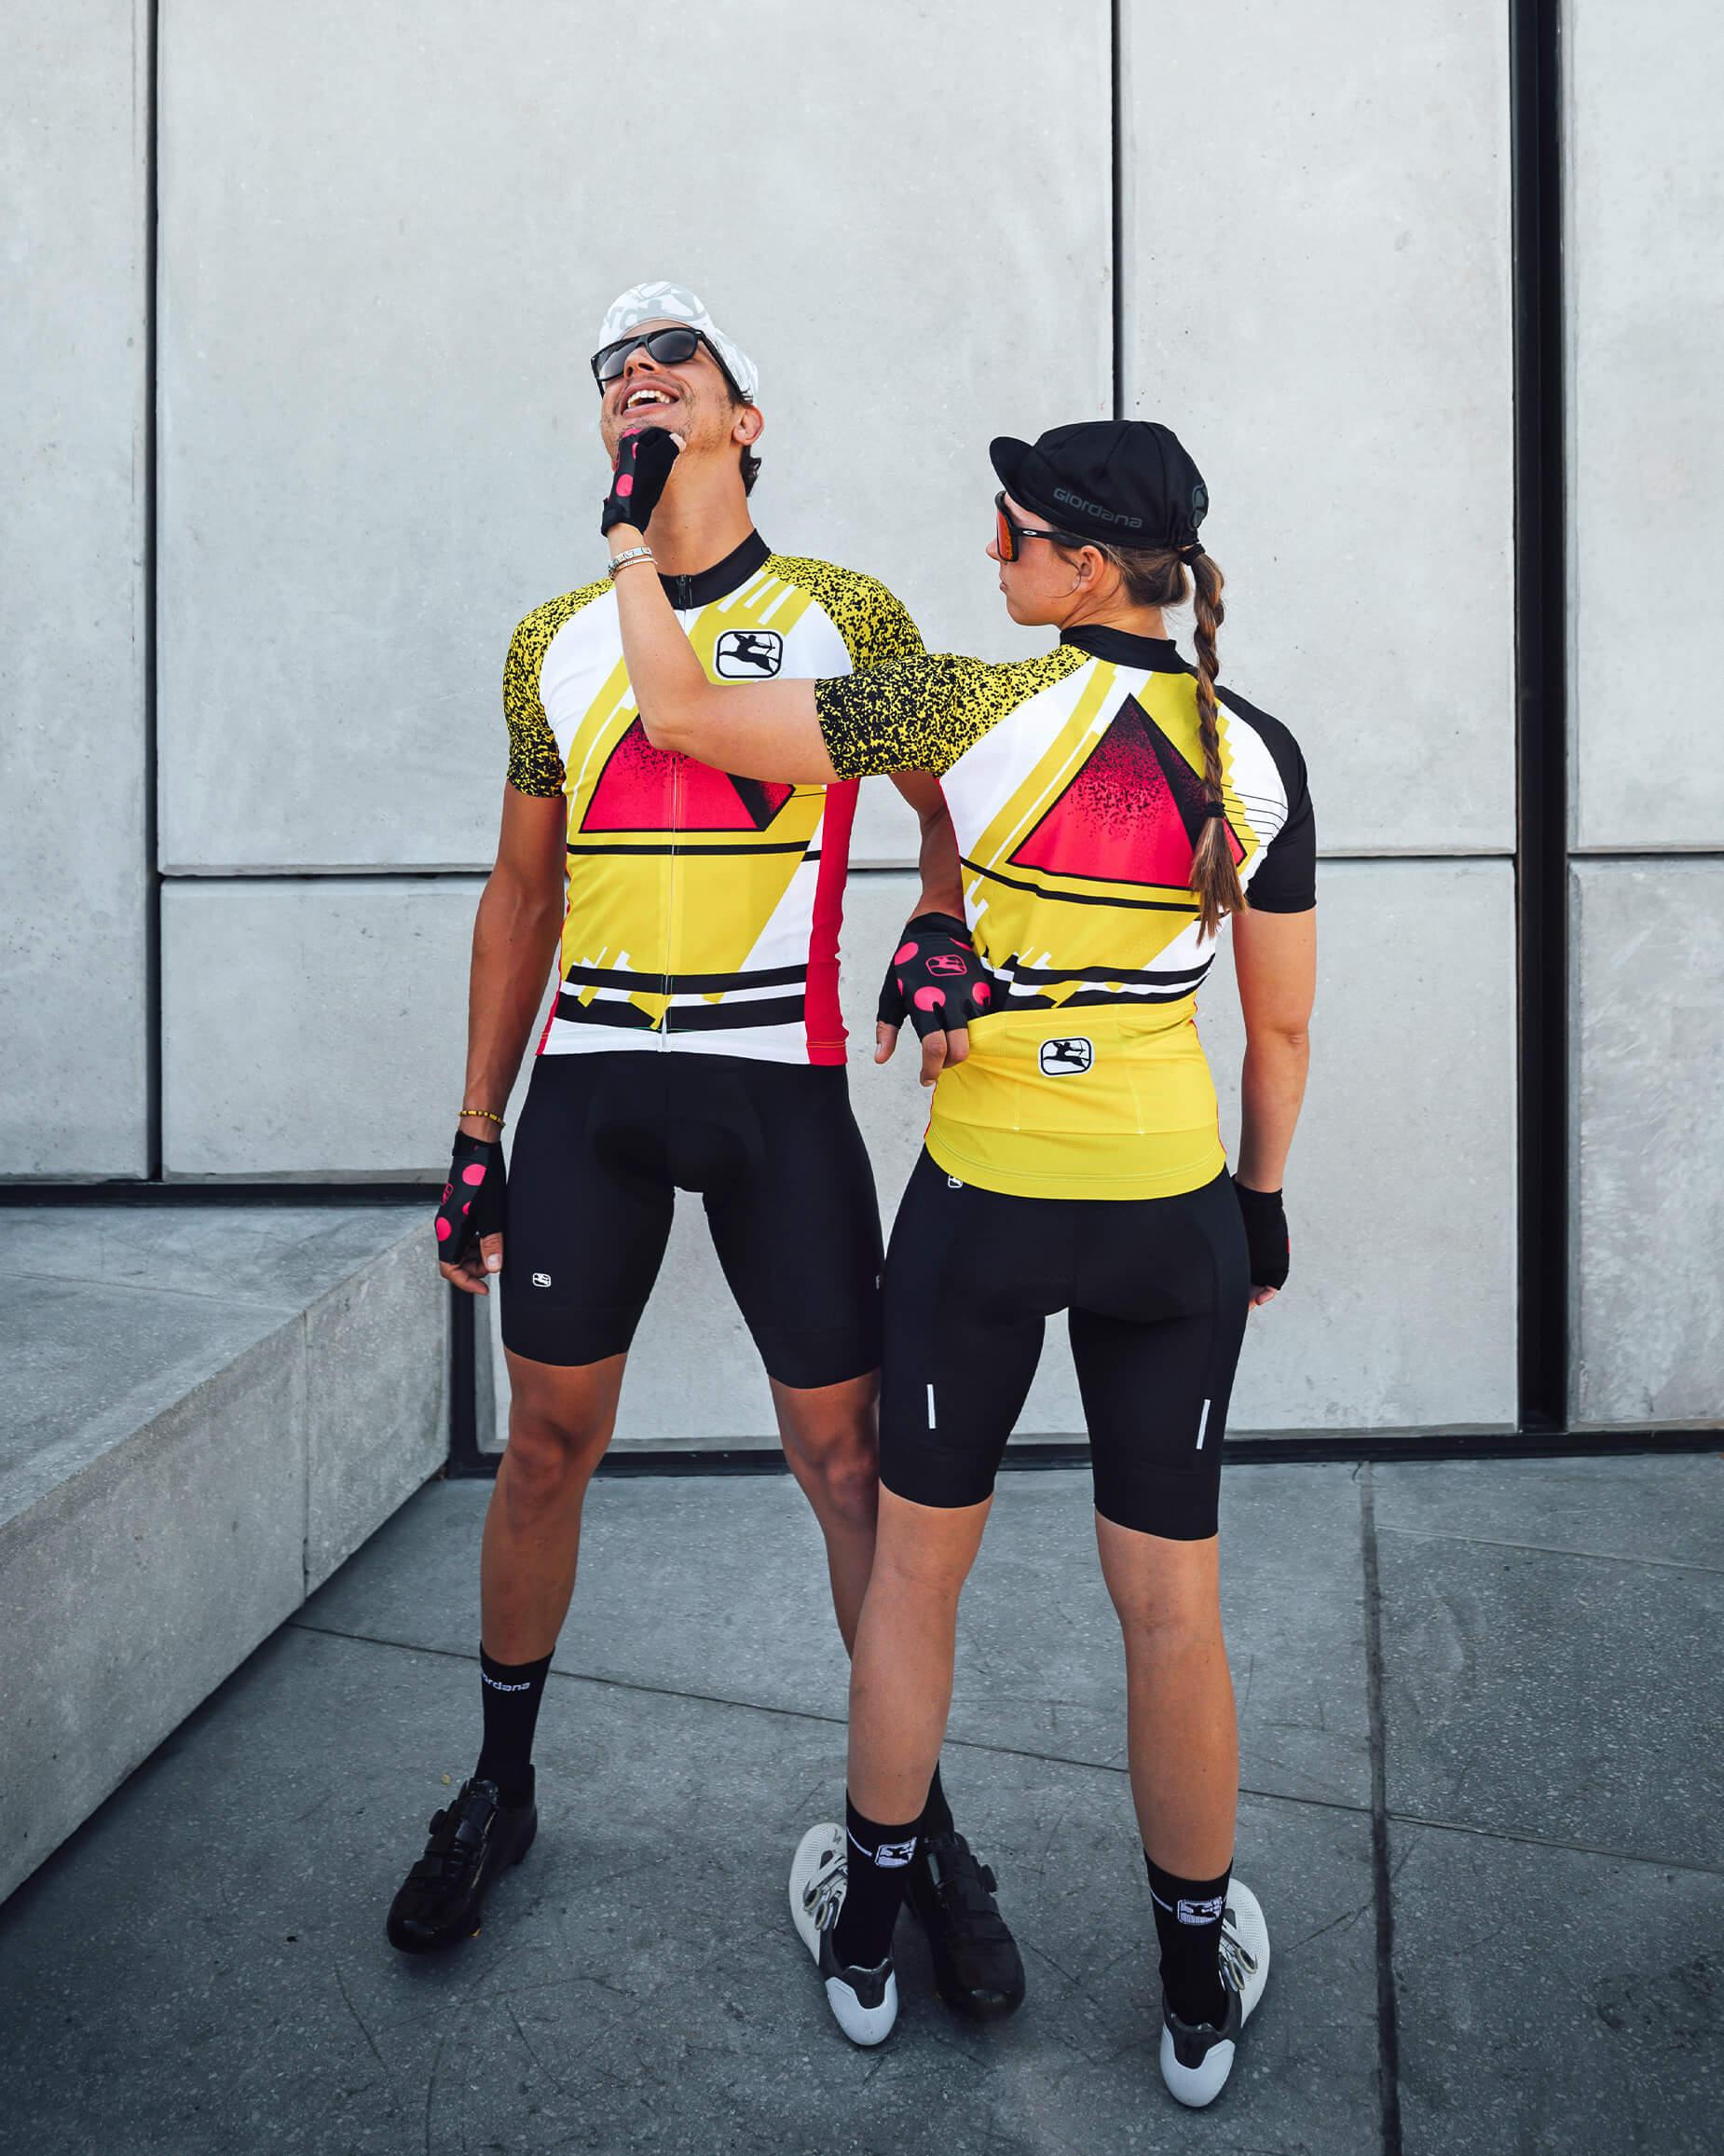 giordana-cycling-moda-retro-lookbook-portrait-1-piramide